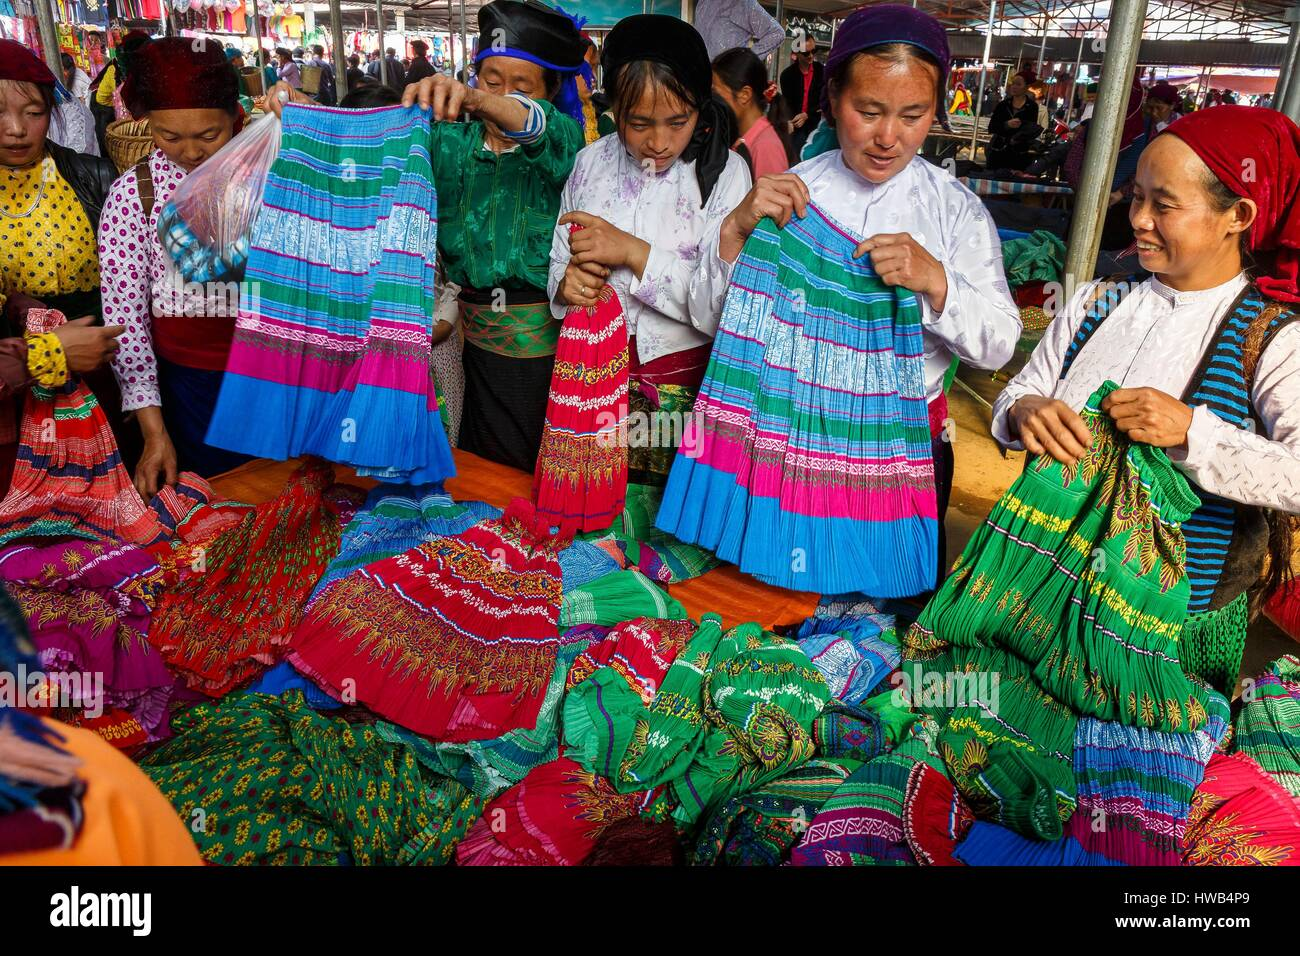 Vietnam, Ha Giang Province, Dong Van, Hmong women buying traditional skirts at the market - Stock Image